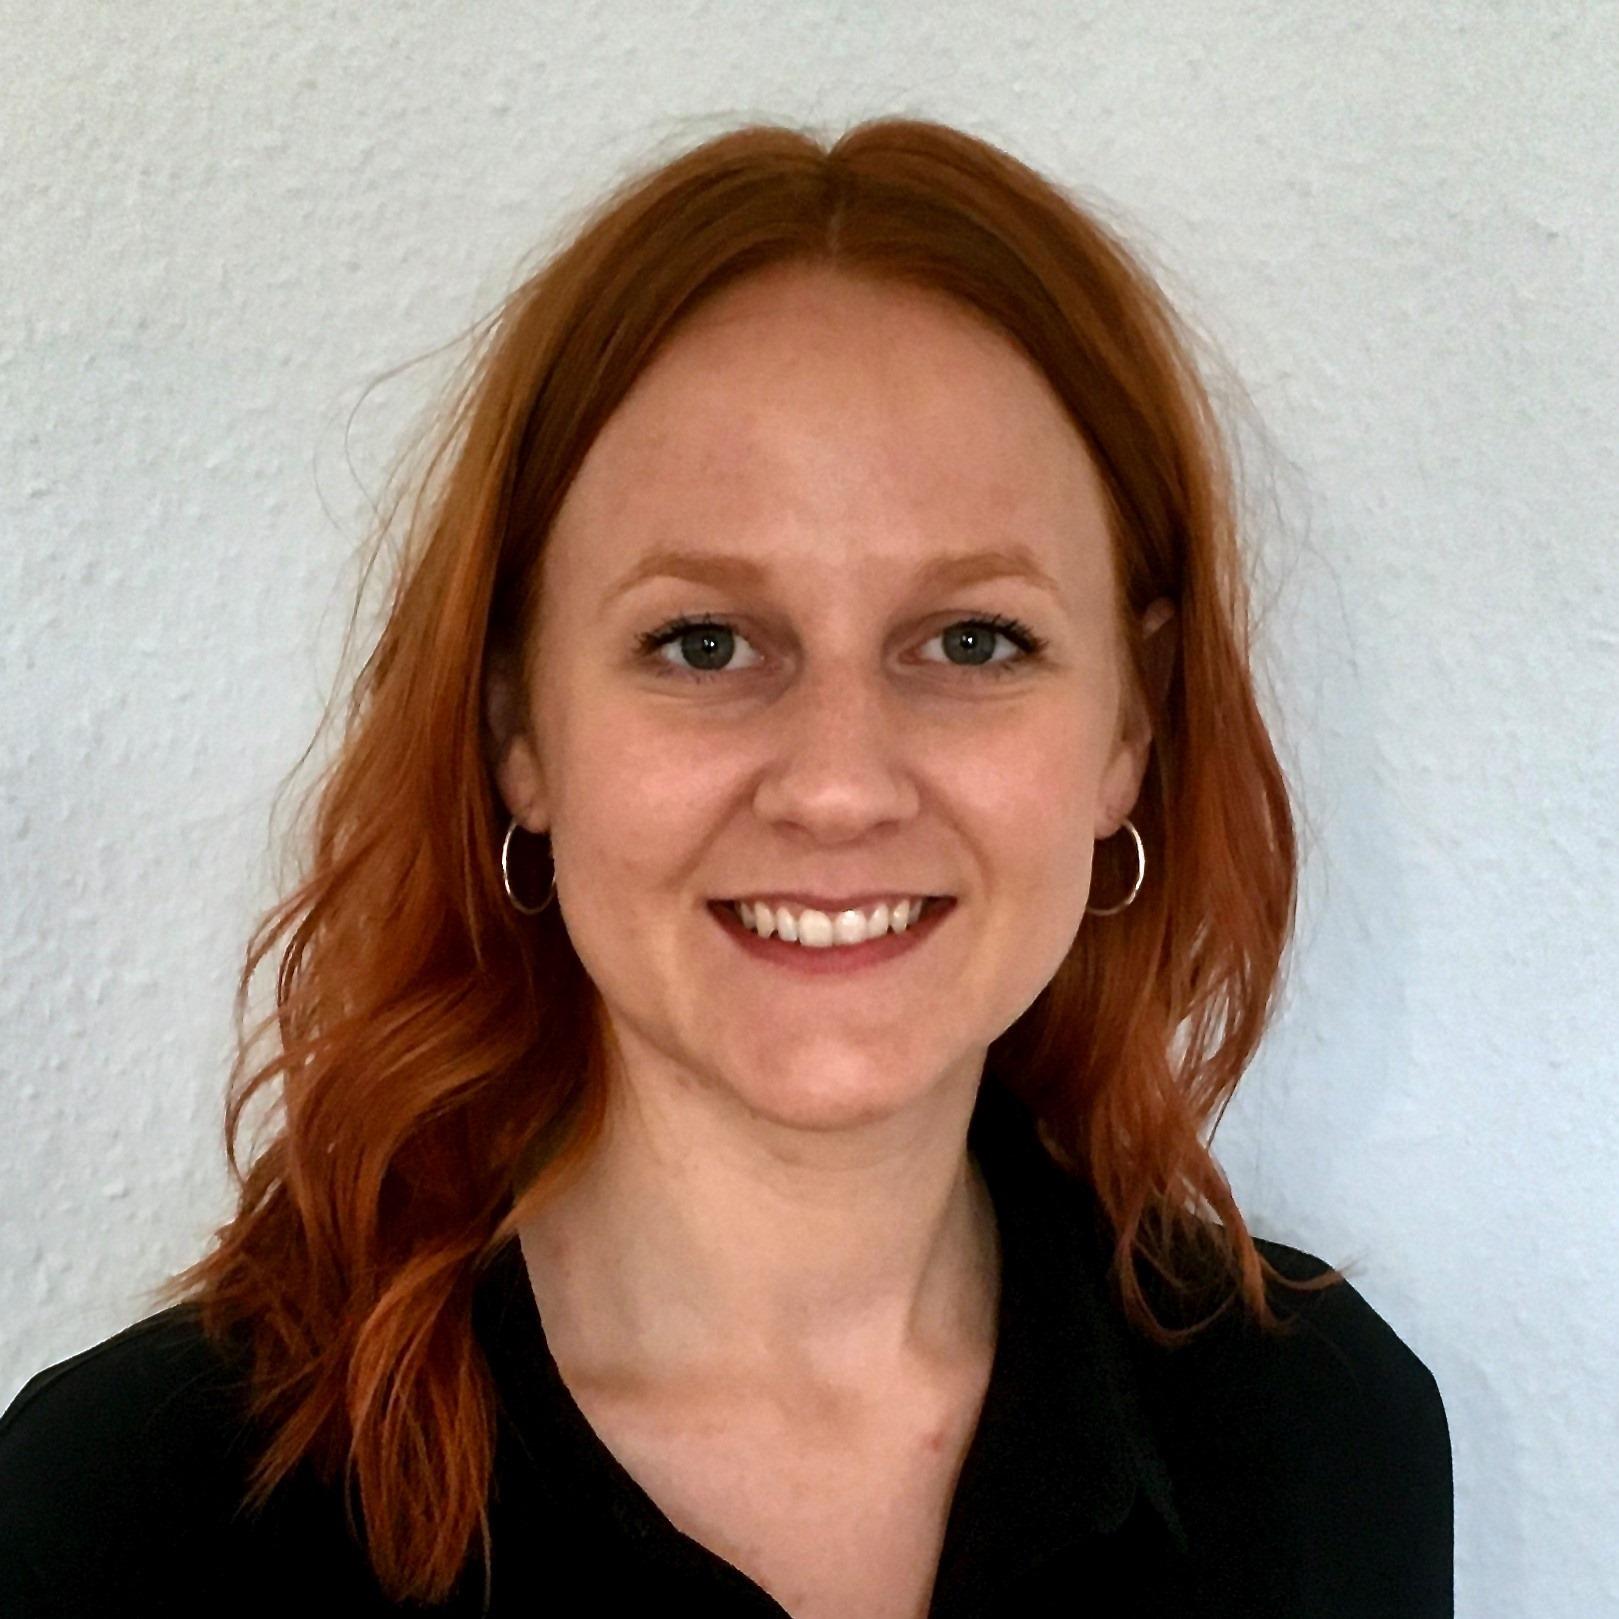 Dorte Meldgaard